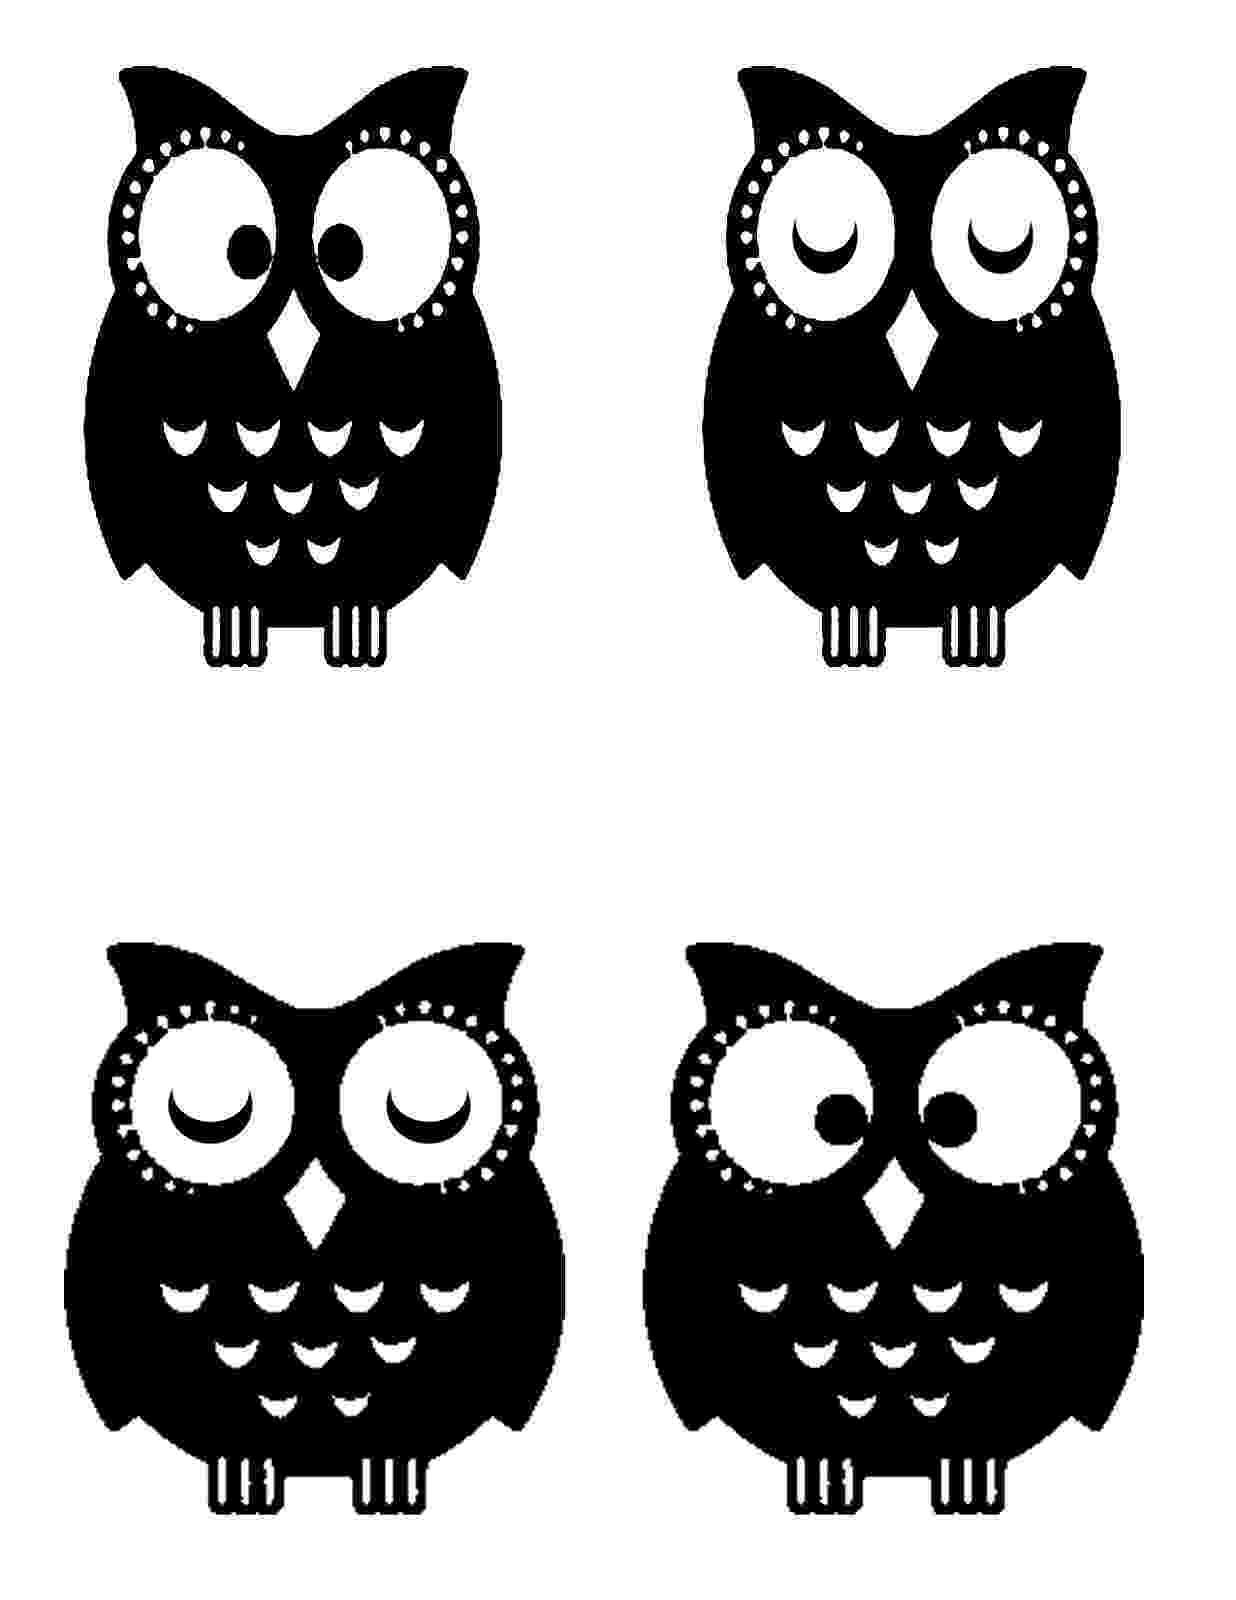 owl printable cartoon owl coloring page free printable coloring pages owl printable